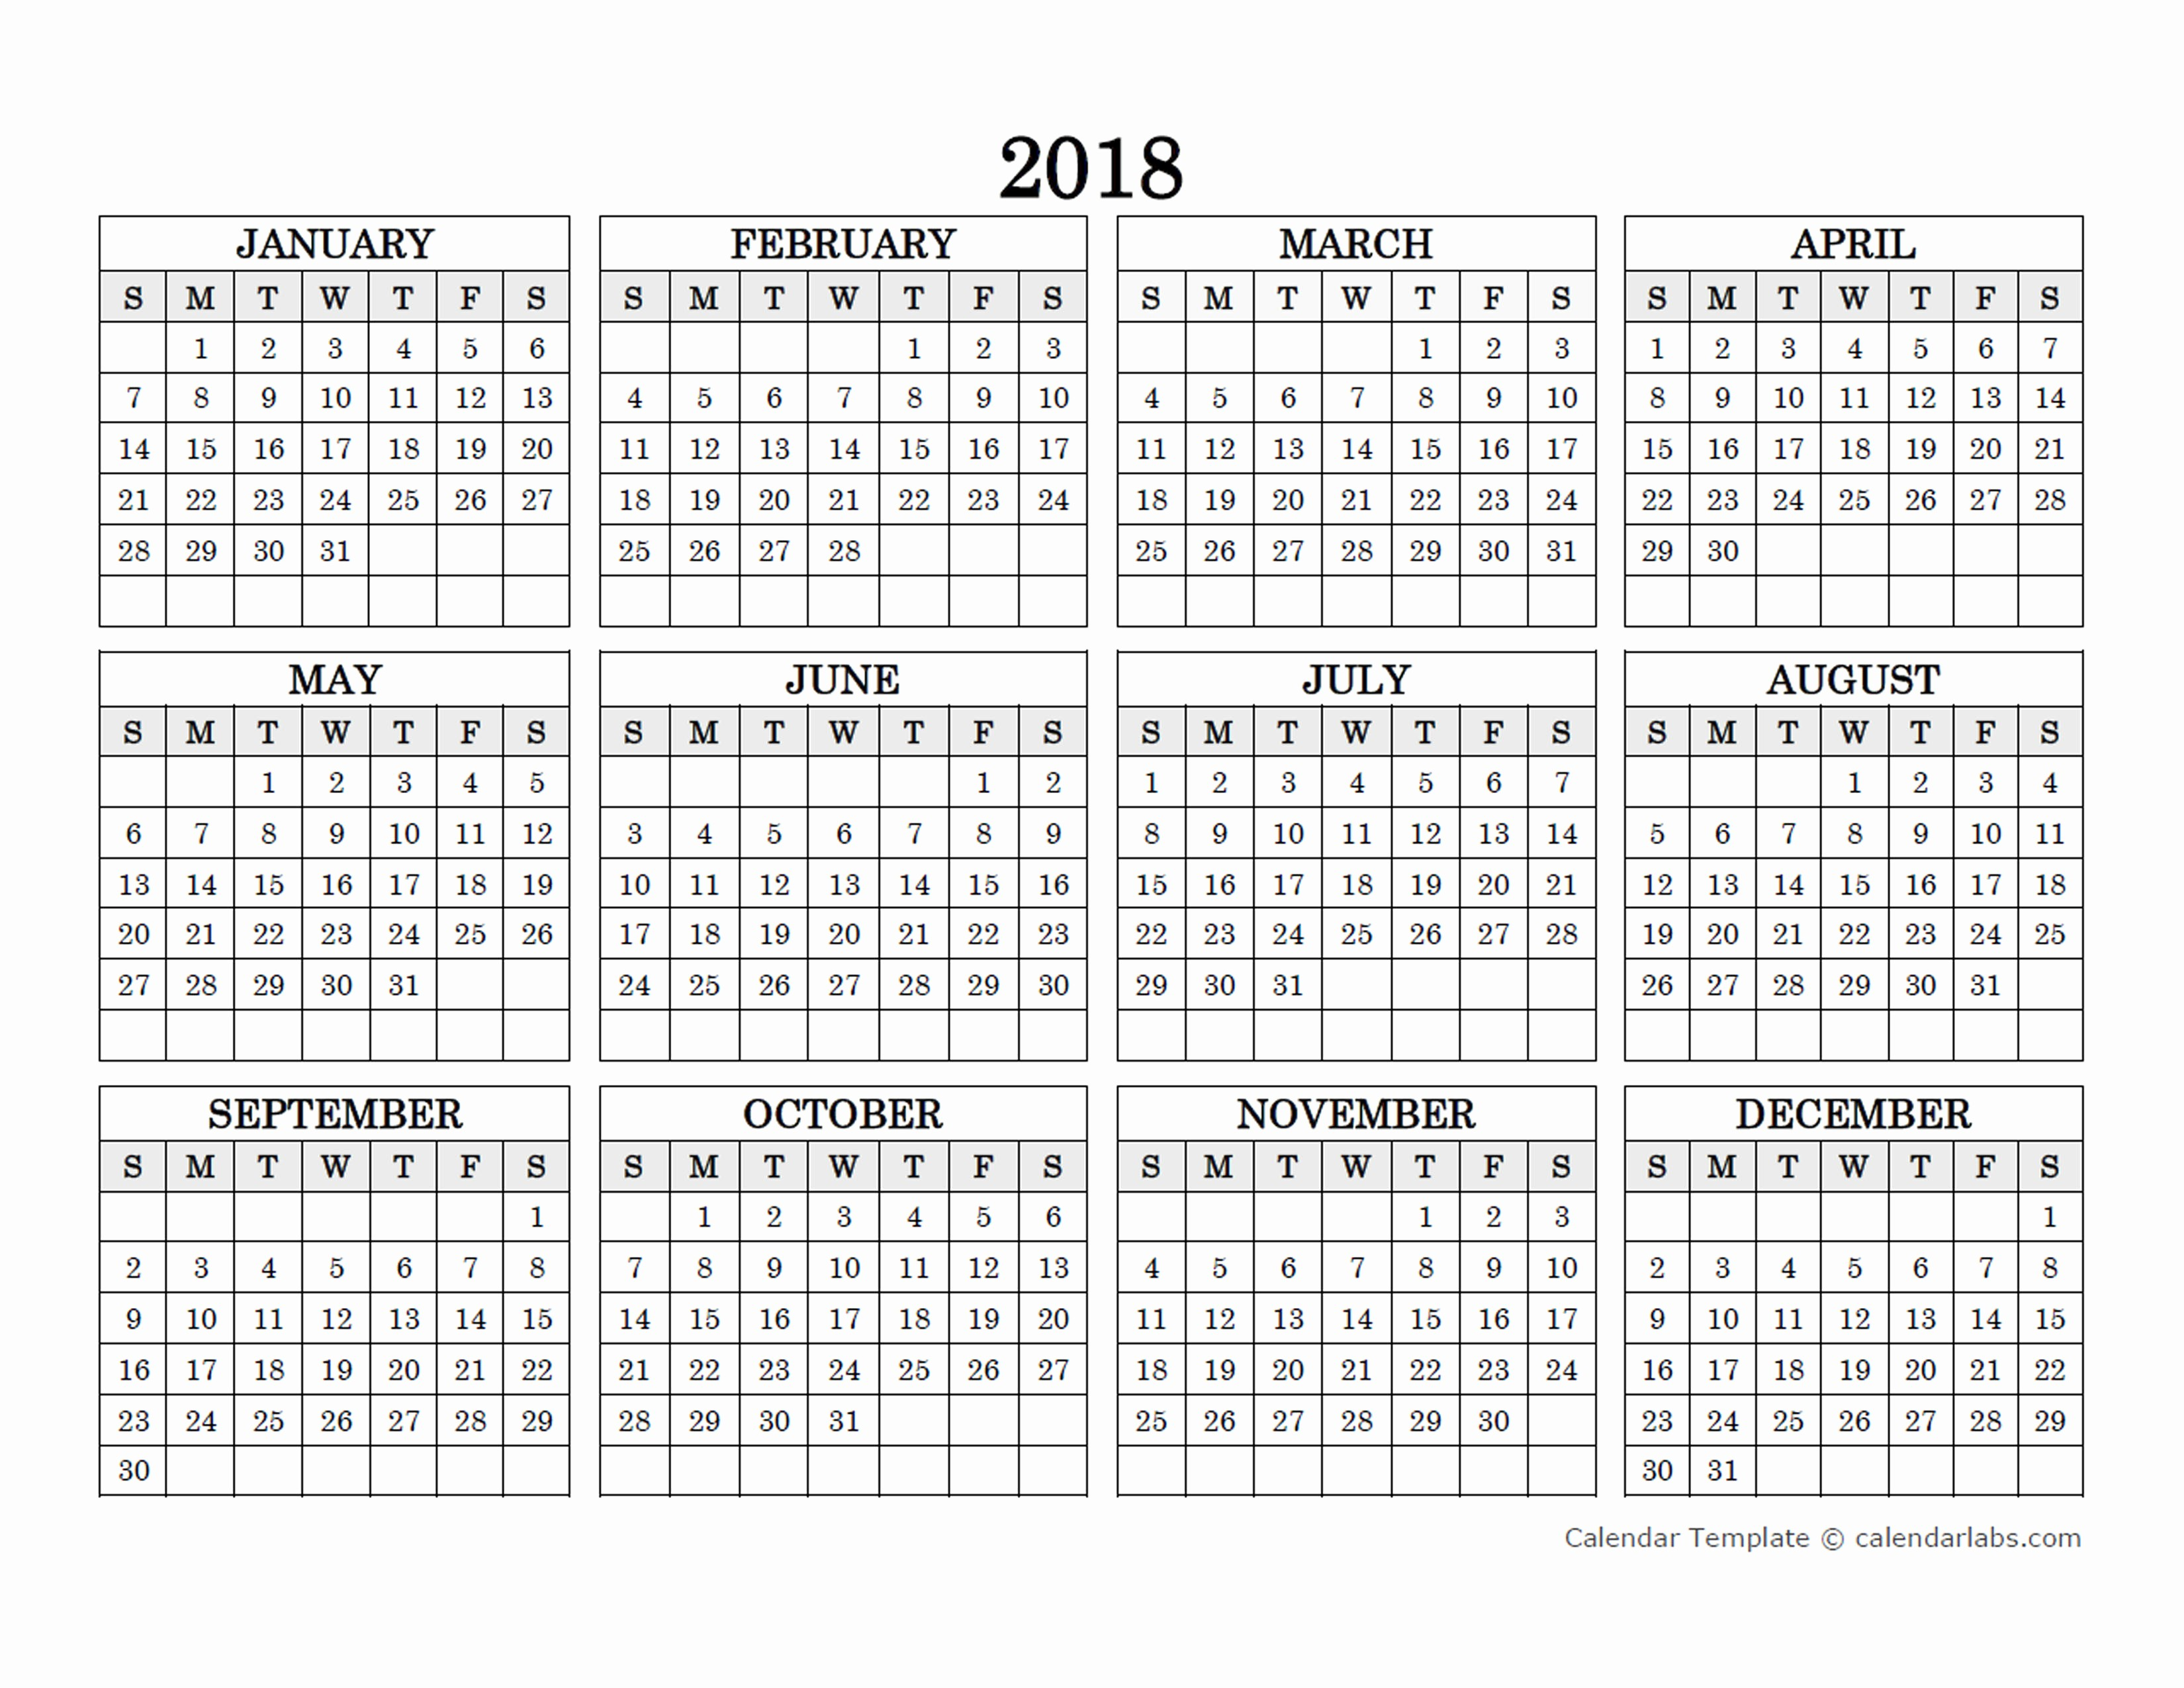 2015 Yearly Calendar Printable Landscape Fresh 2018 Blank Yearly Calendar Landscape Free Printable